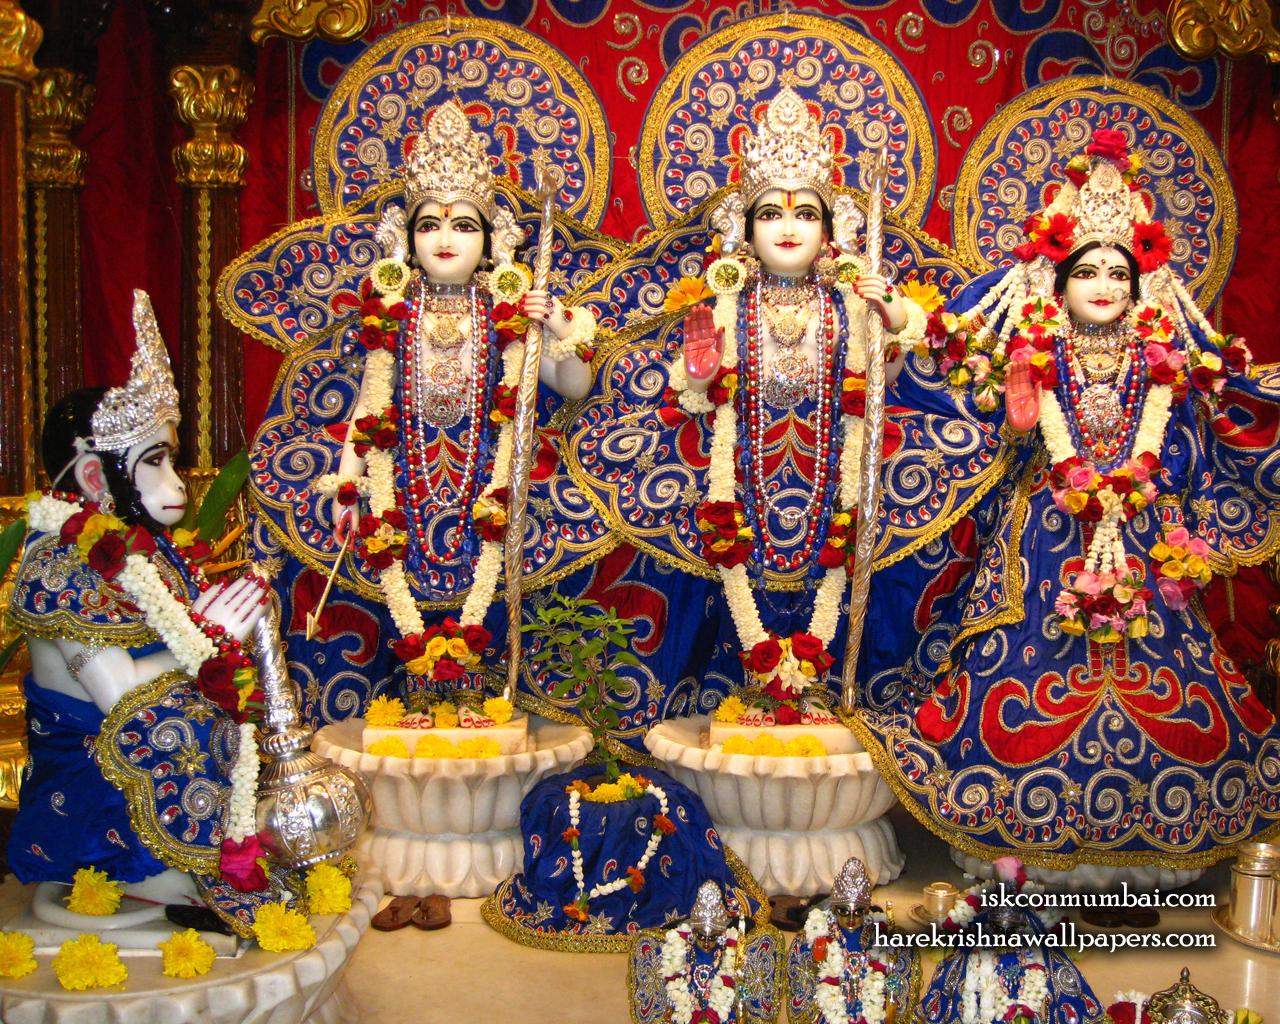 Sri Sri Sita Rama Laxman Hanuman Wallpaper (004) Size 1280x1024 Download